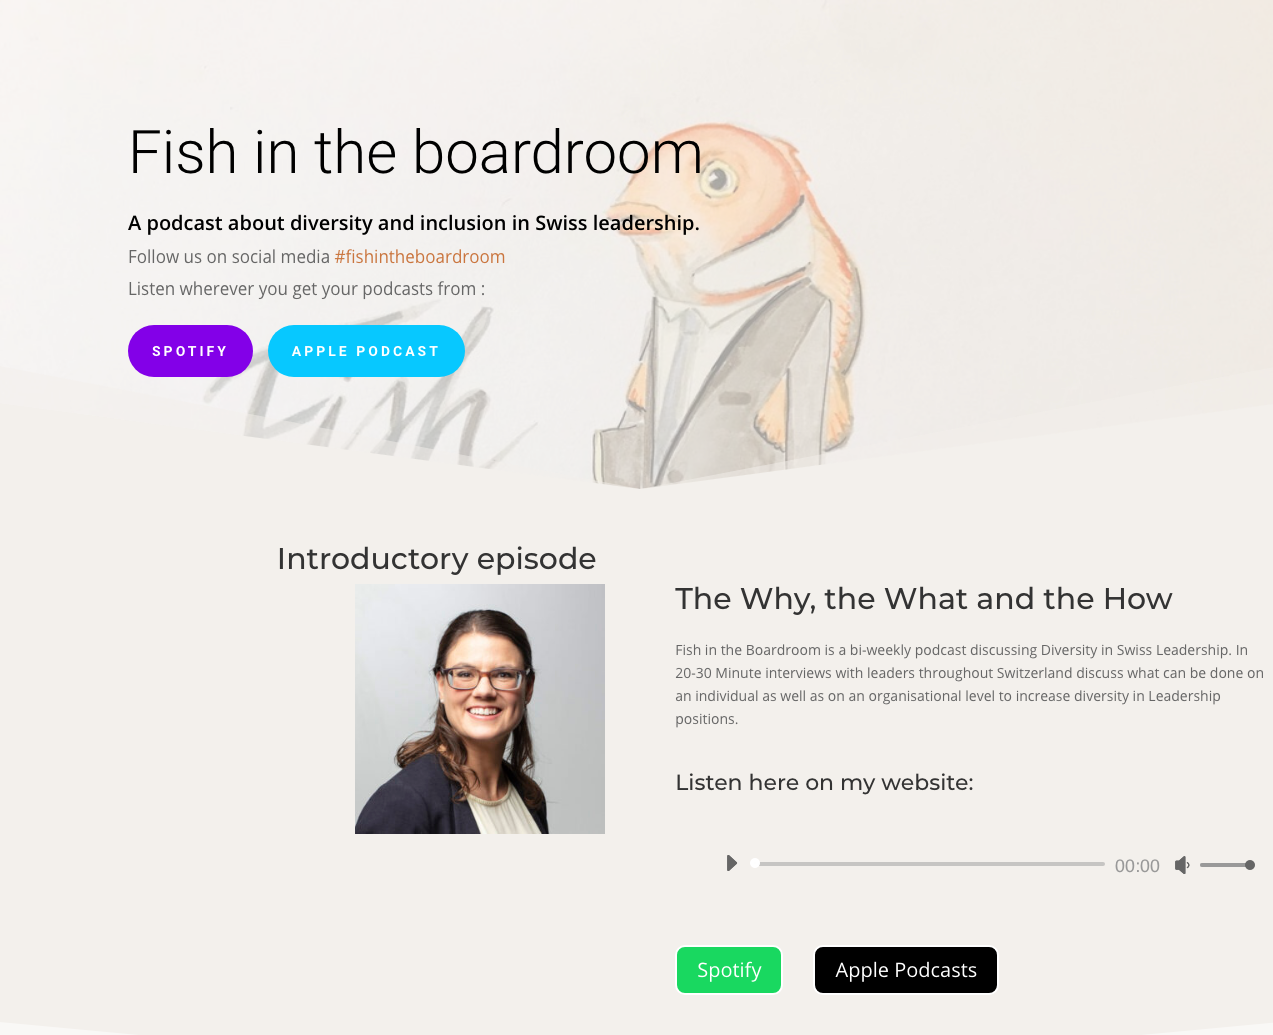 Fish in the boardroom